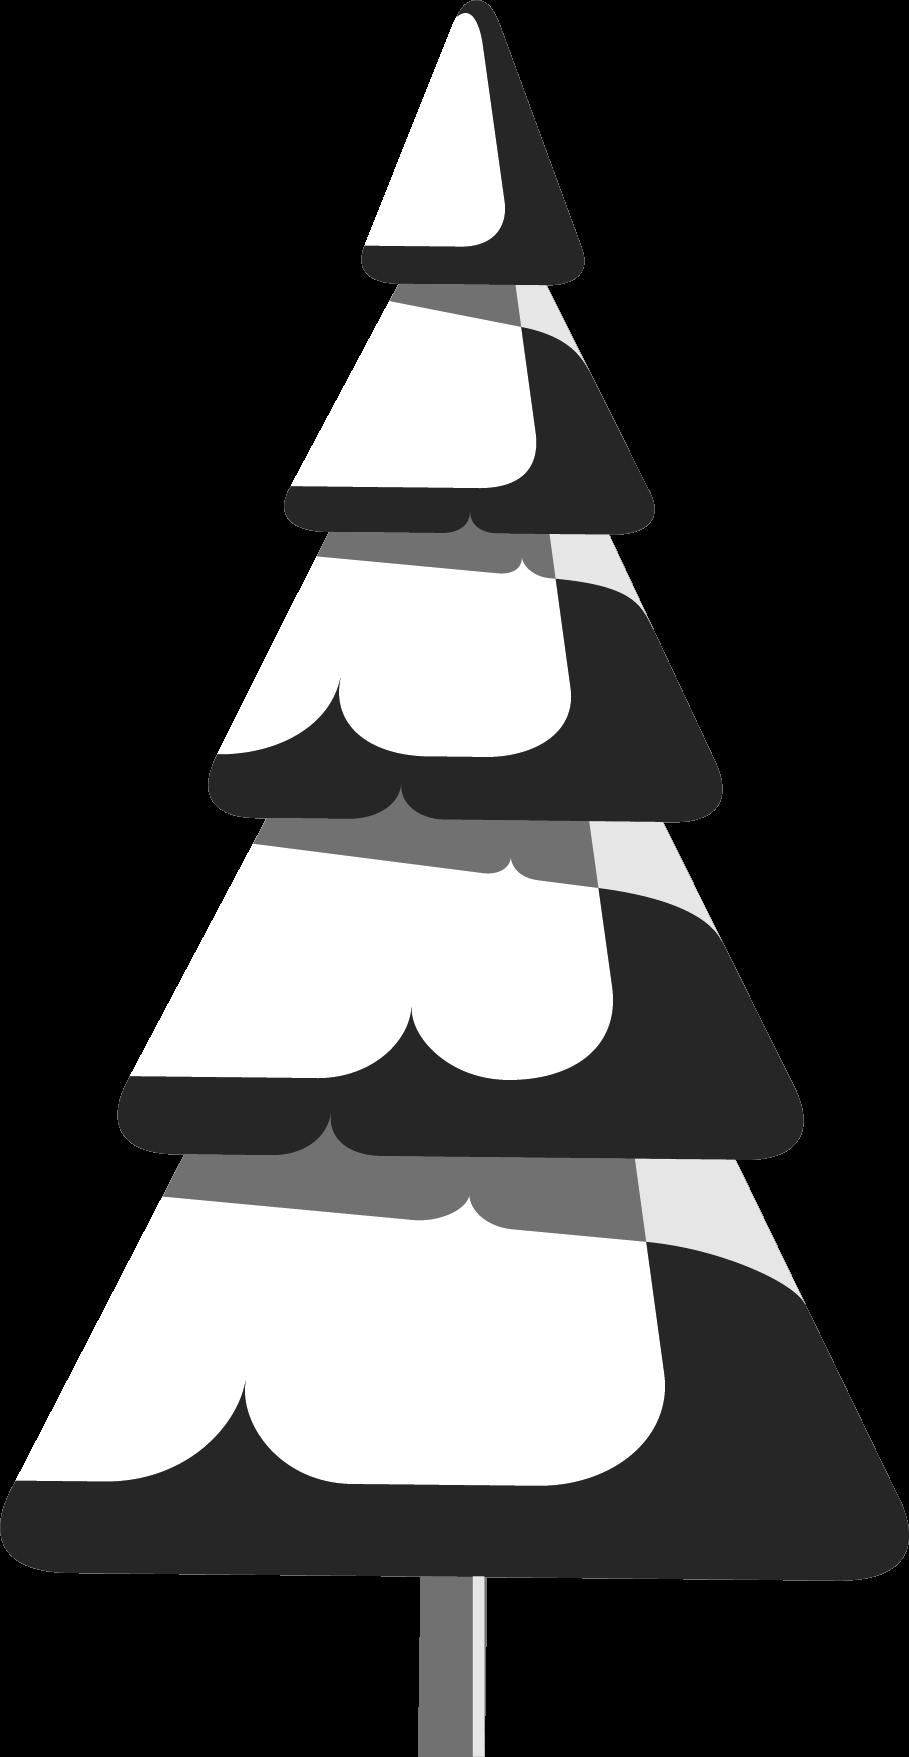 Santa's Nordmann - Groothandel Kerstbomen